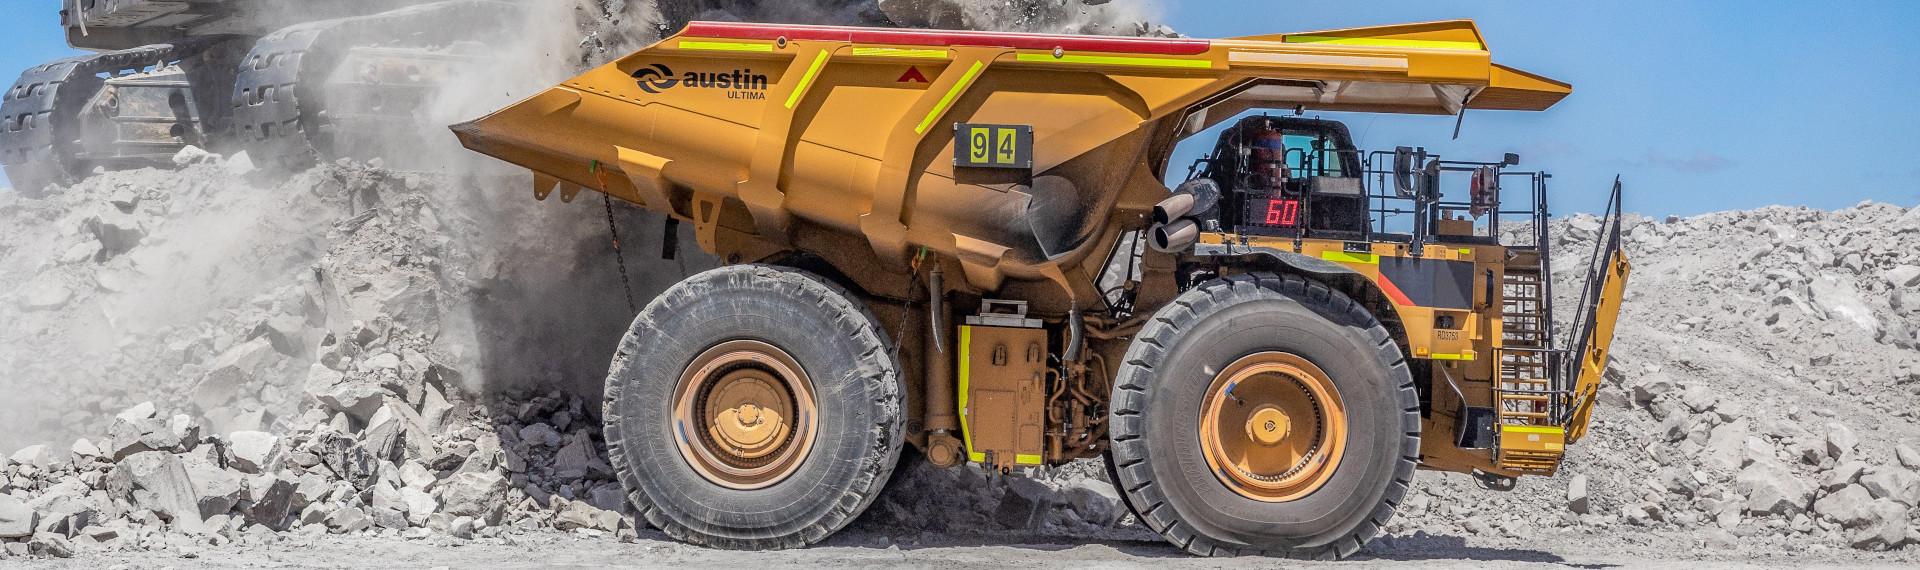 Hardox® 500 Tuf를 사용하여 중량을 25% 줄인 Austin의 초대형 광산용 트럭